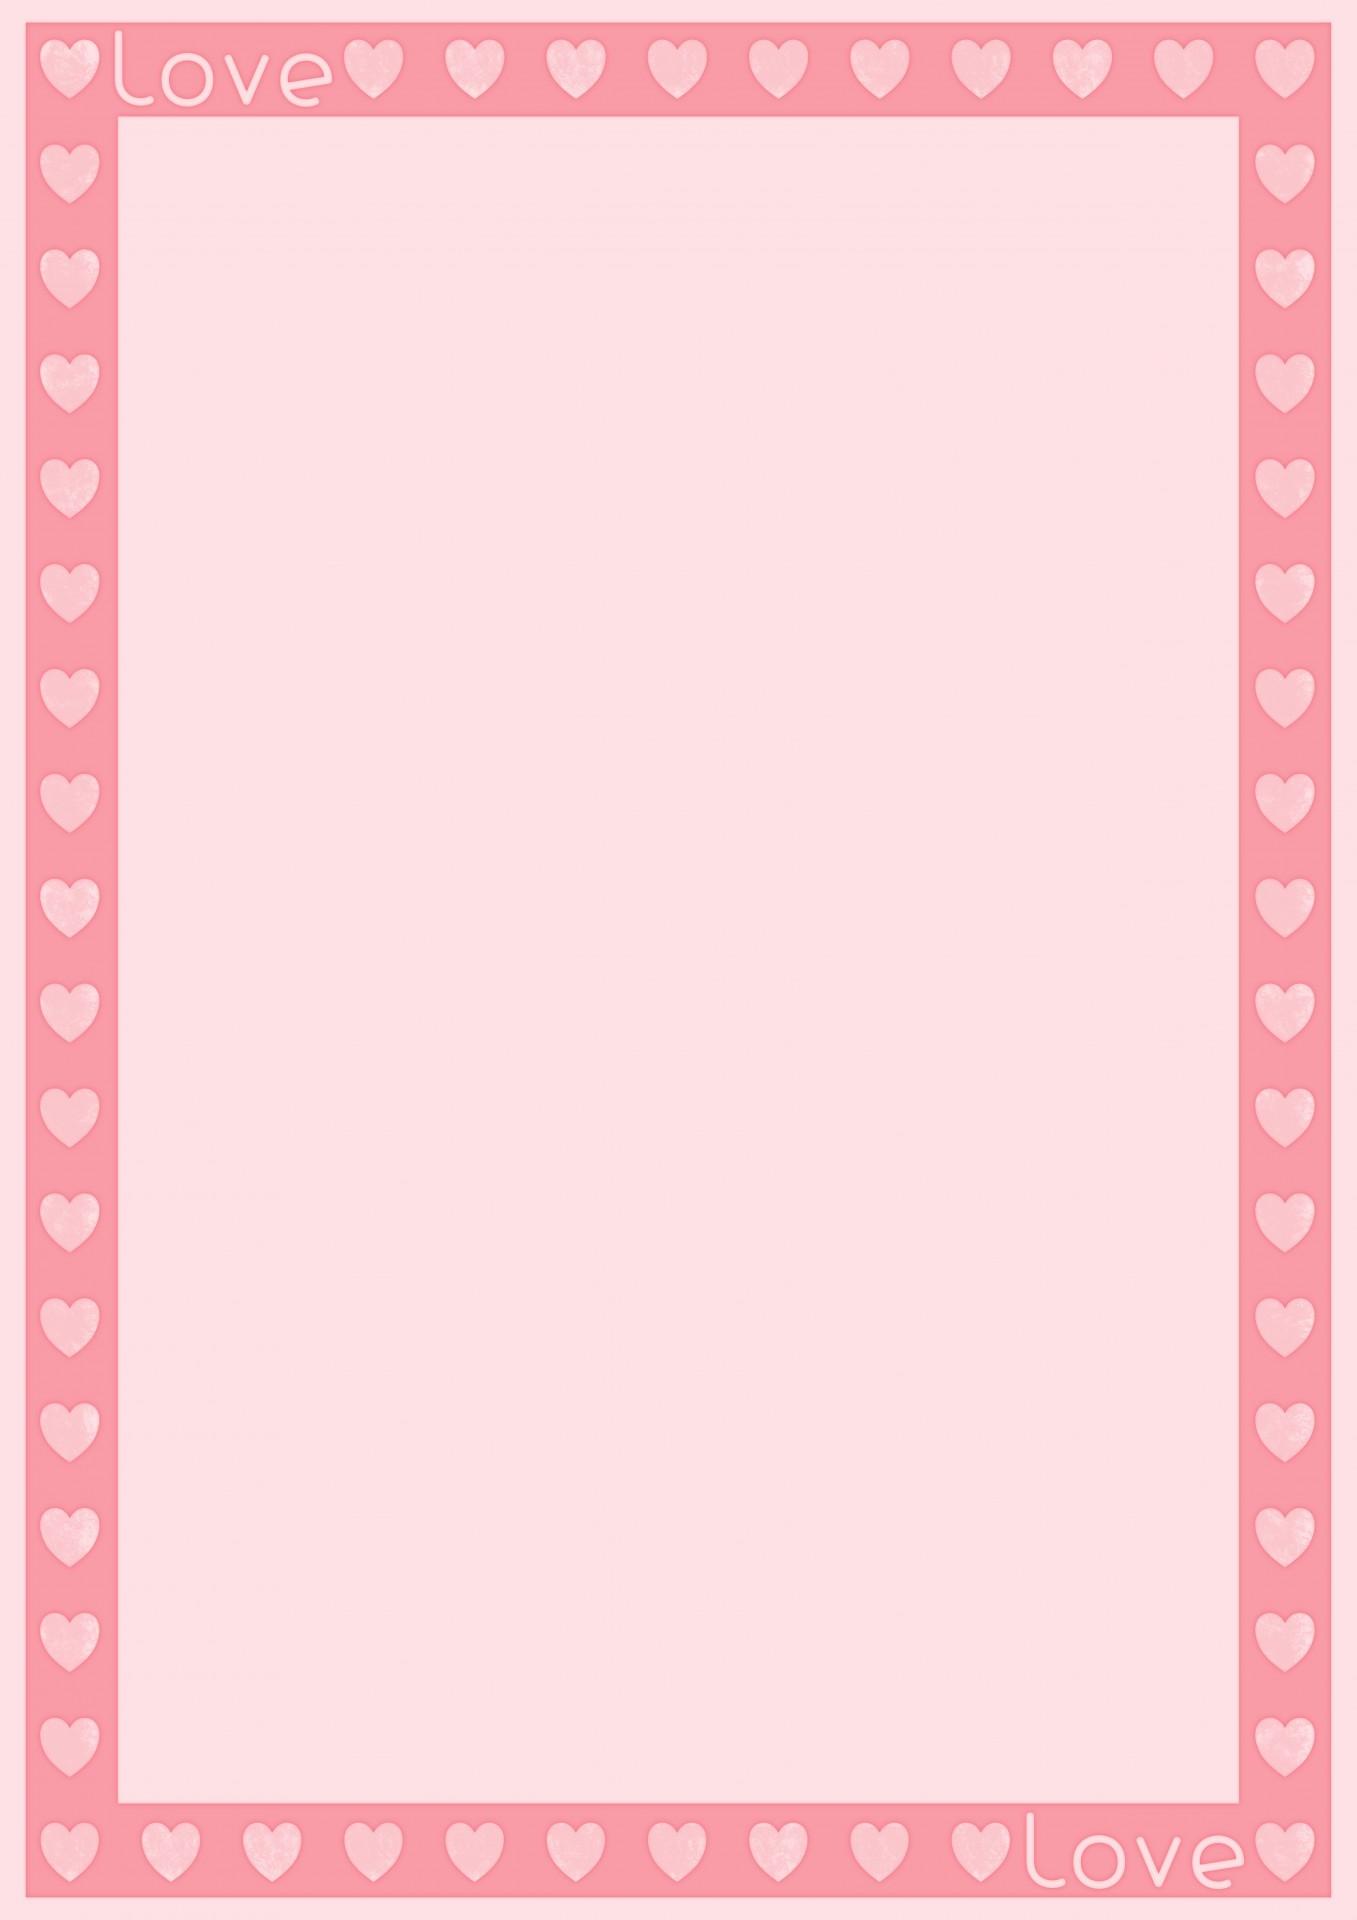 Love Heart Template Free Stock Photo